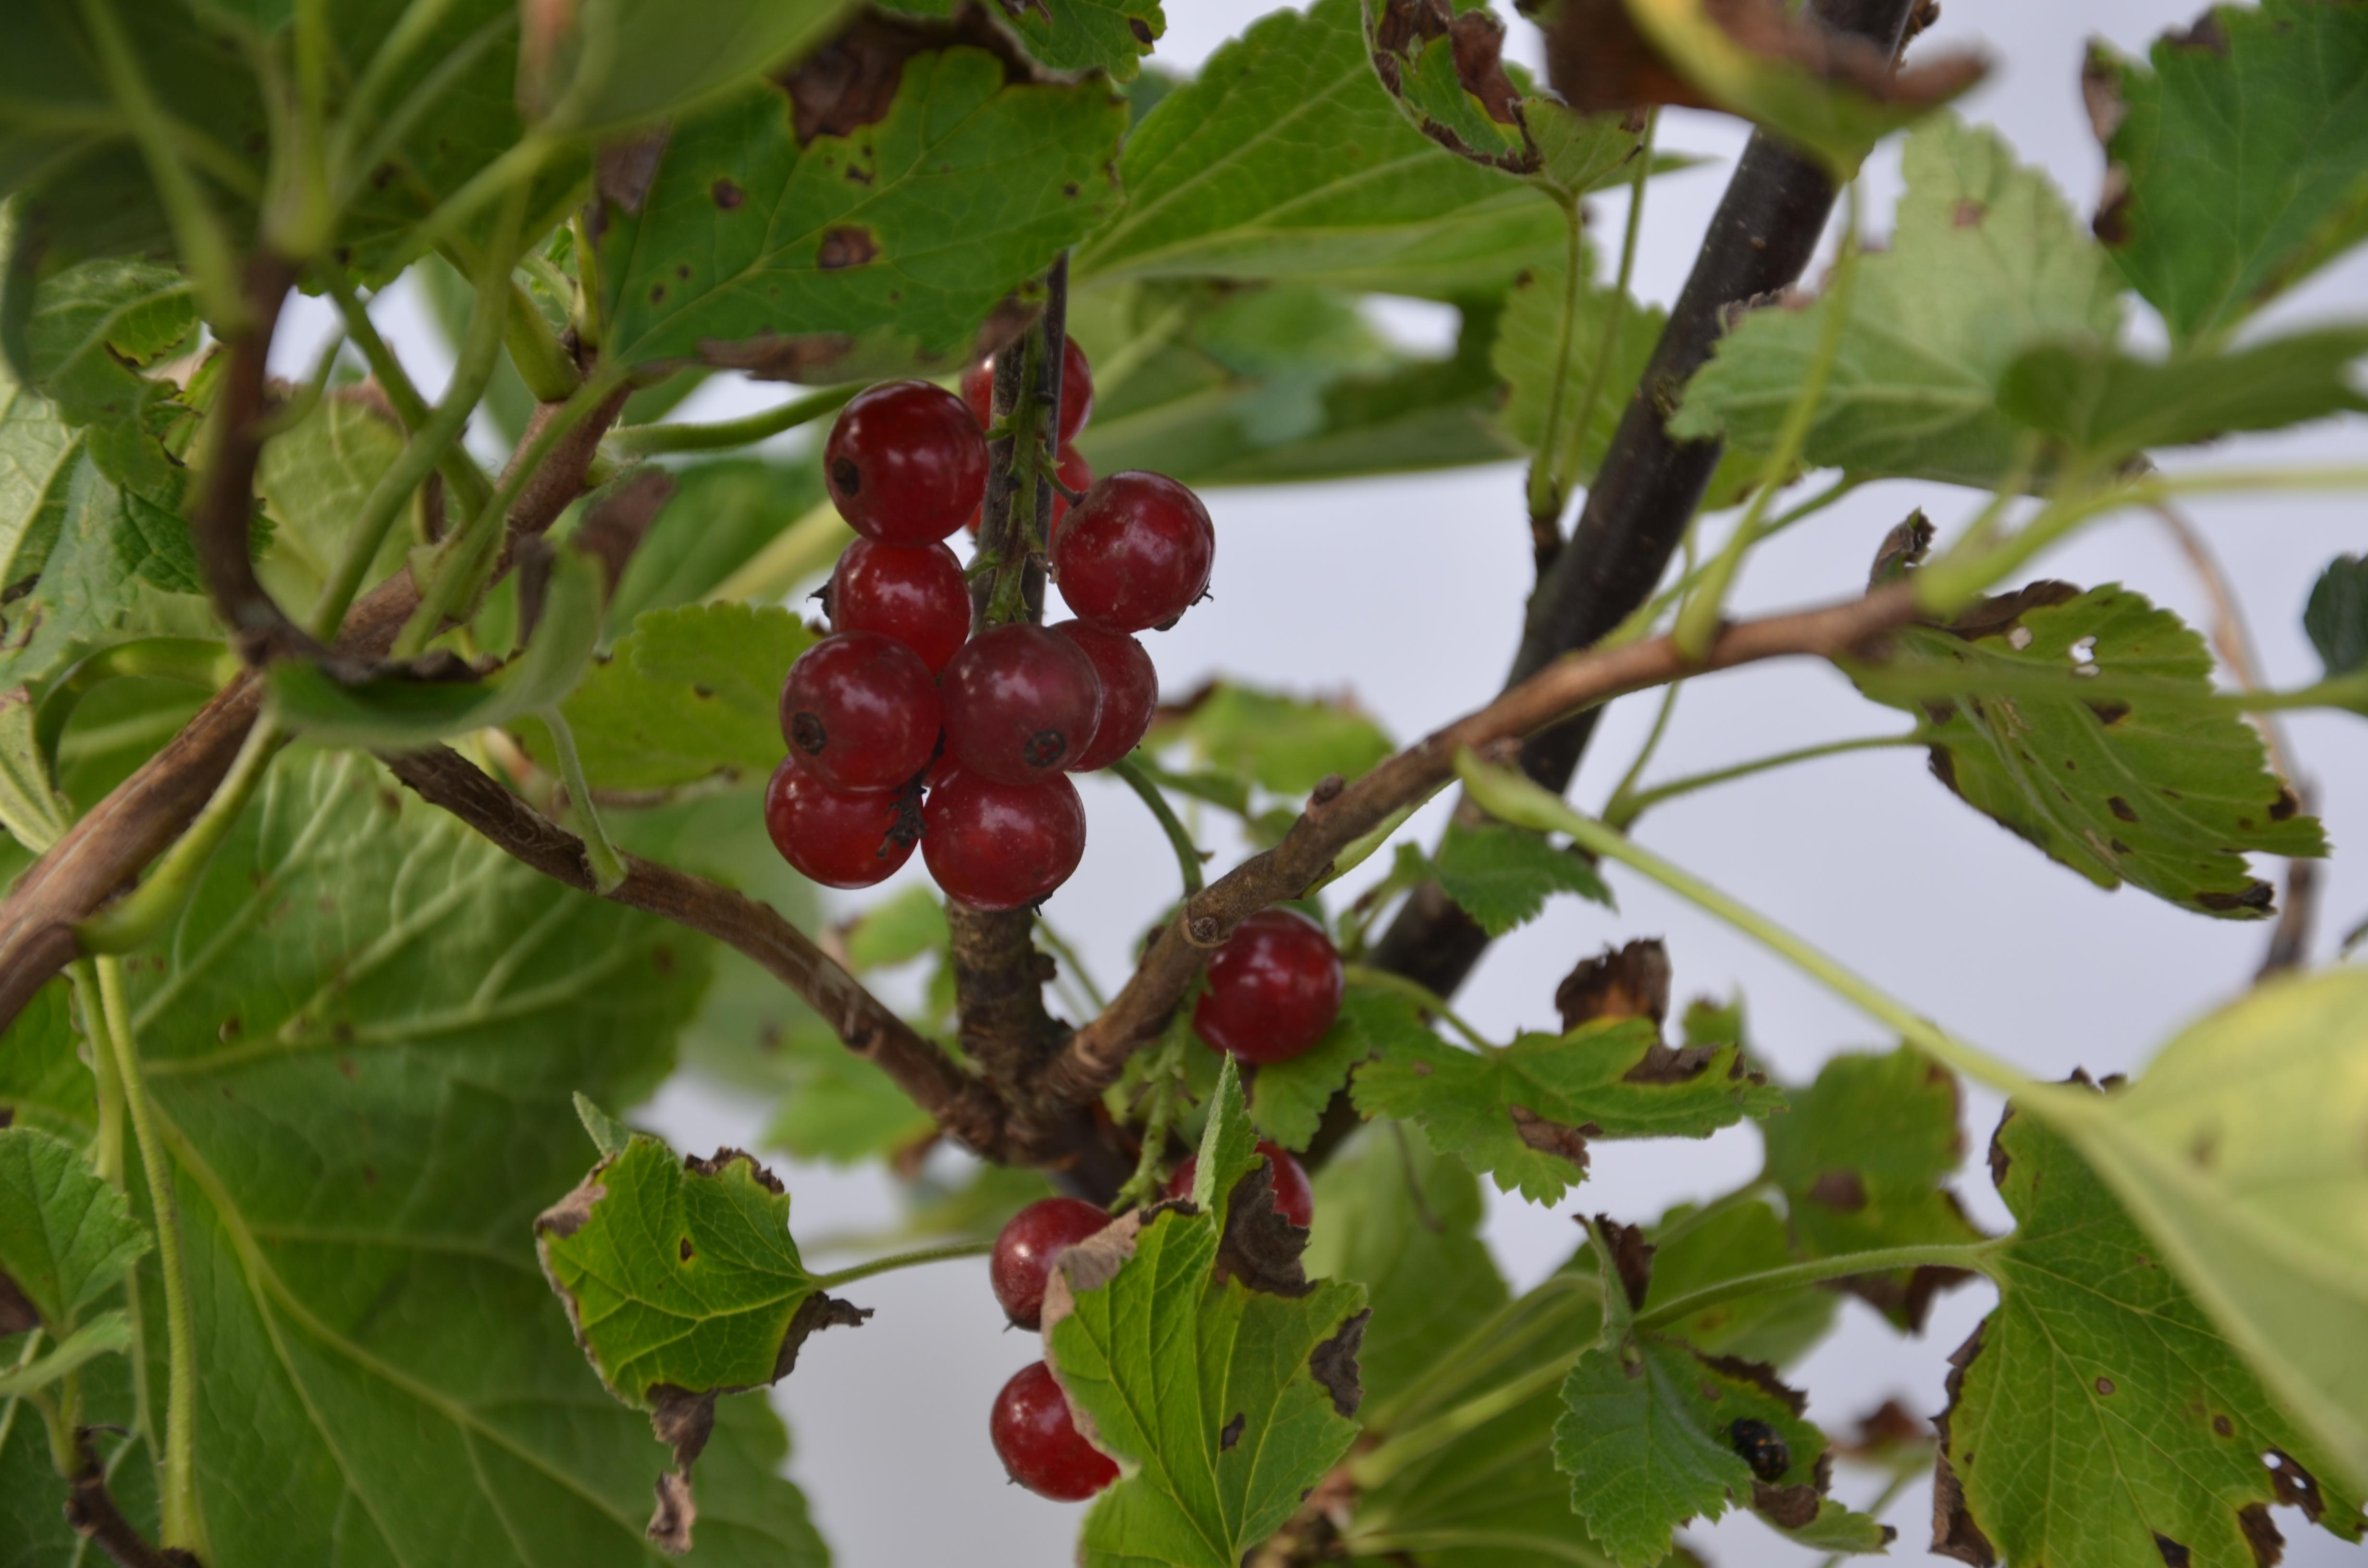 red lake gadelier terra bor al vente d 39 arbustes fruitiersterra bor al vente d 39 arbustes. Black Bedroom Furniture Sets. Home Design Ideas